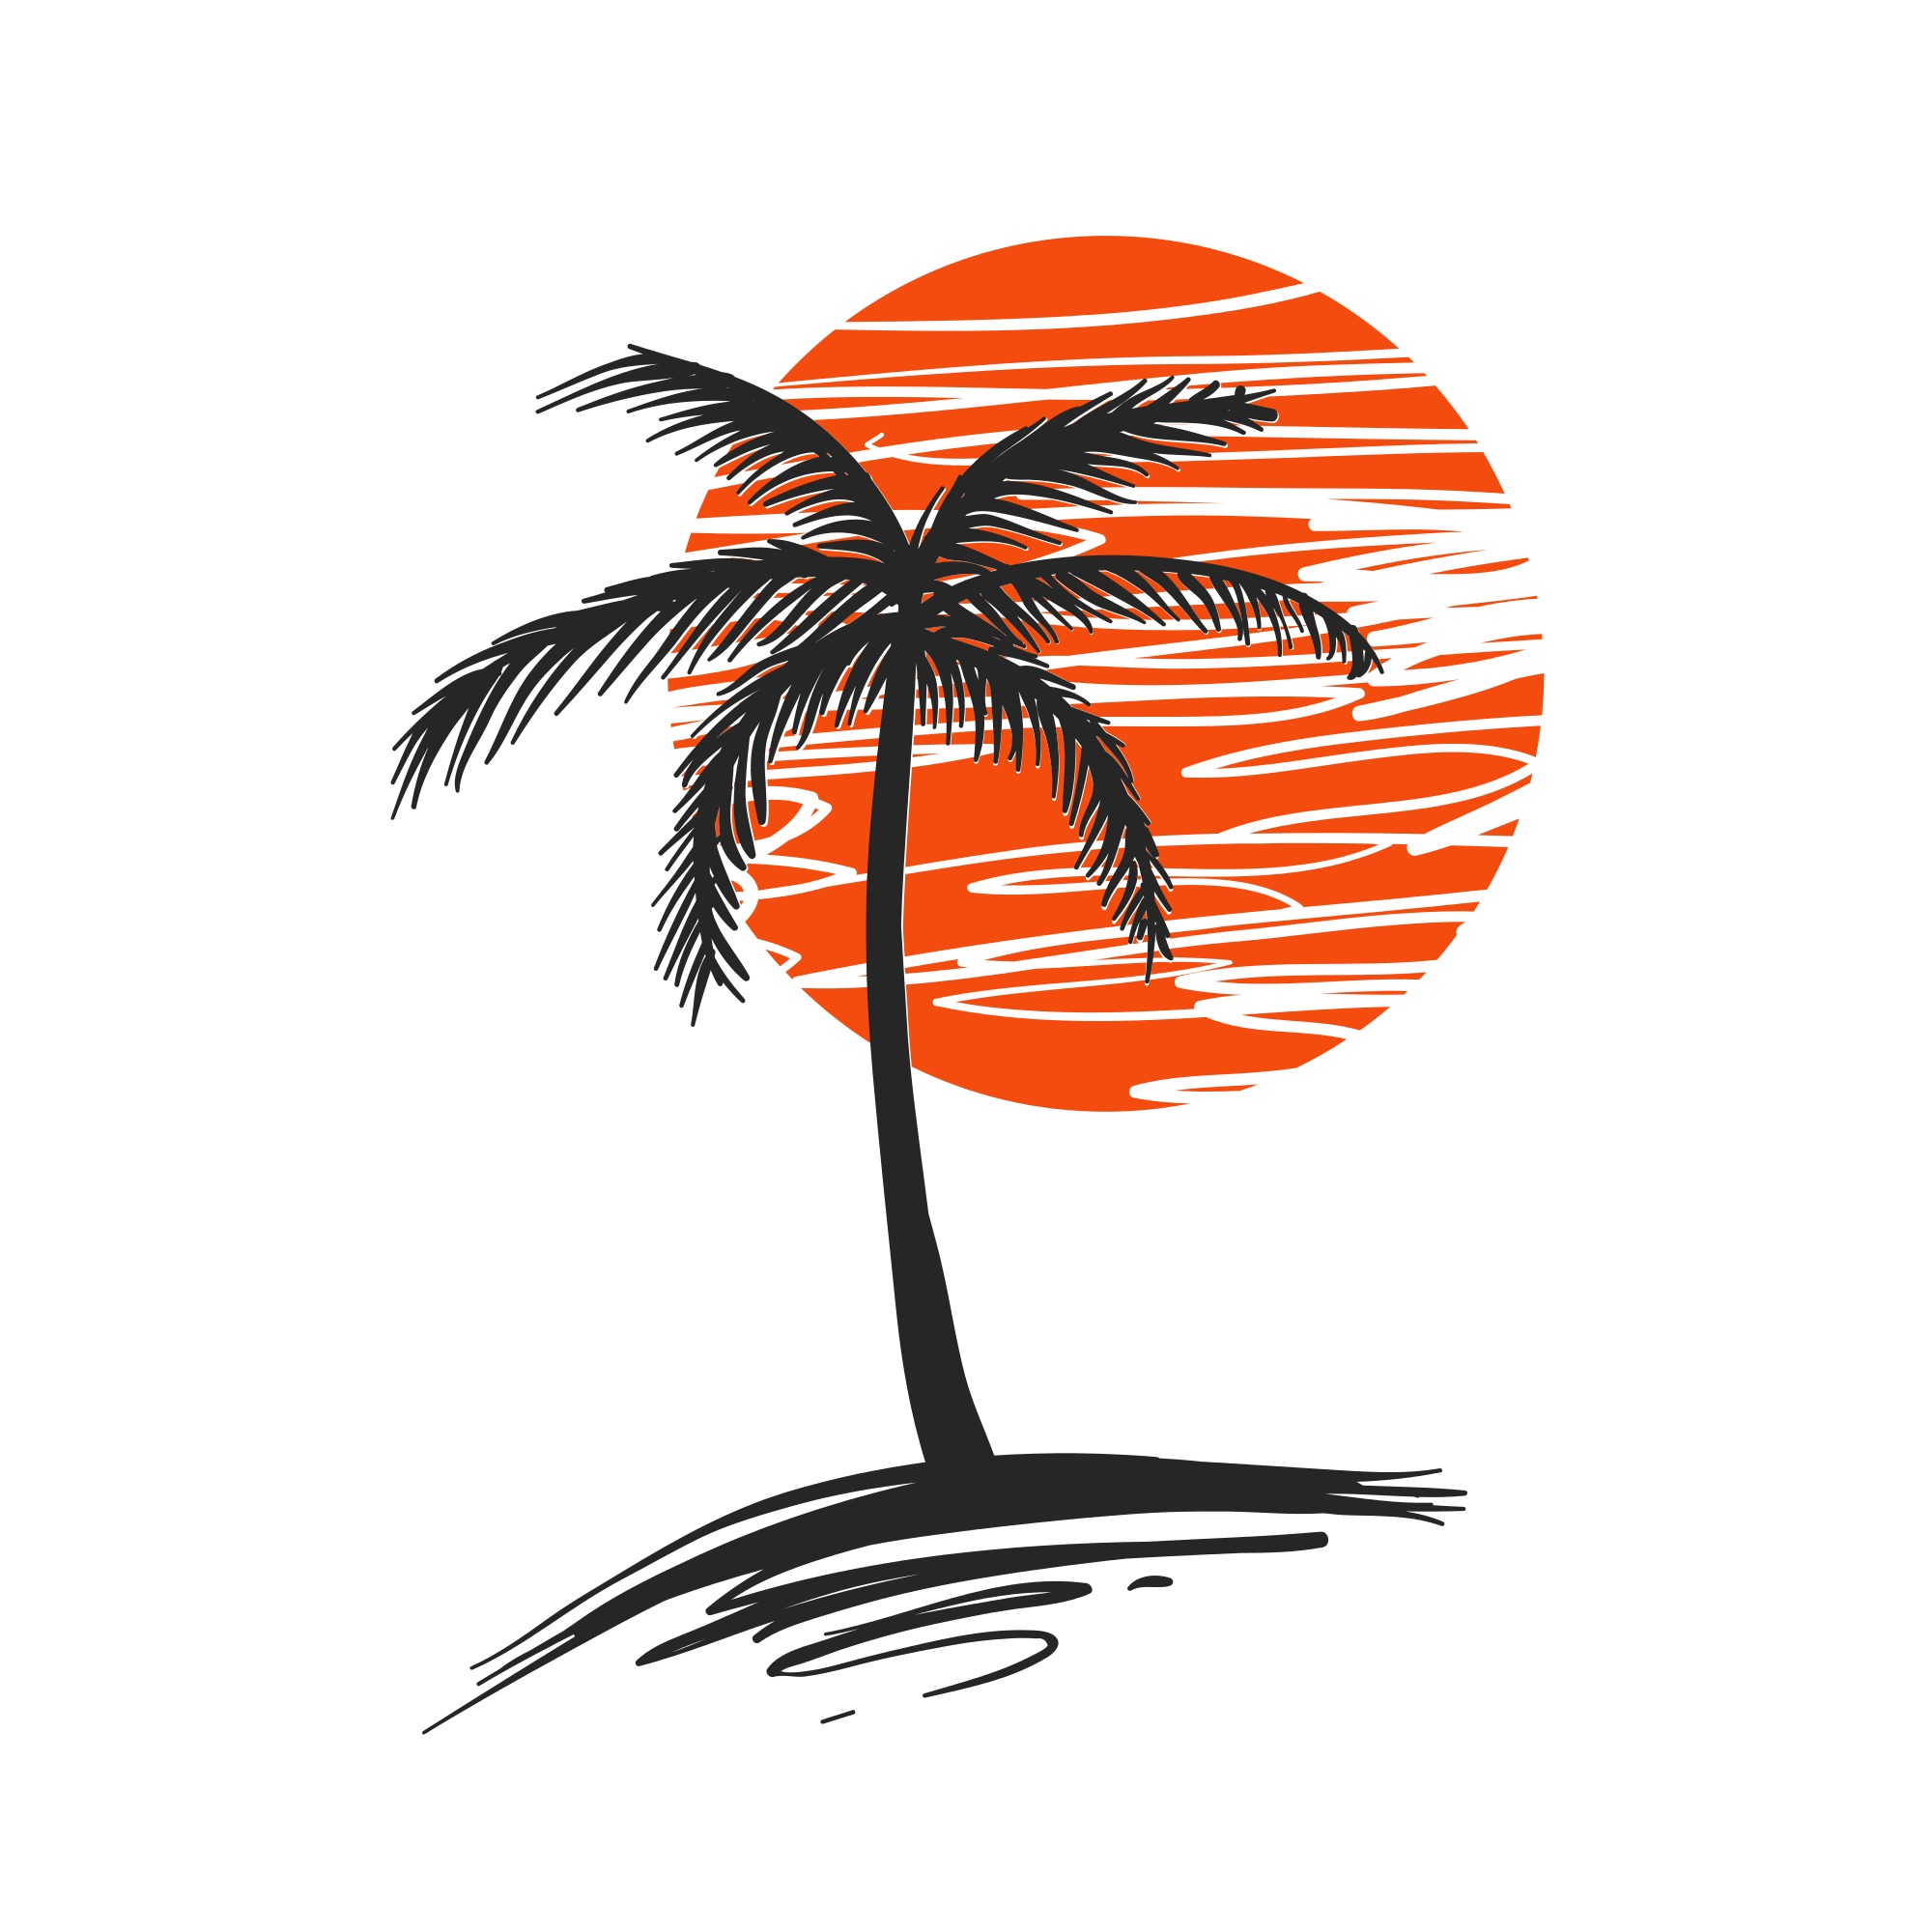 6 000 free palm tree vector art files illustrations rh vecteezy com palm tree vector free download palm tree vector free download